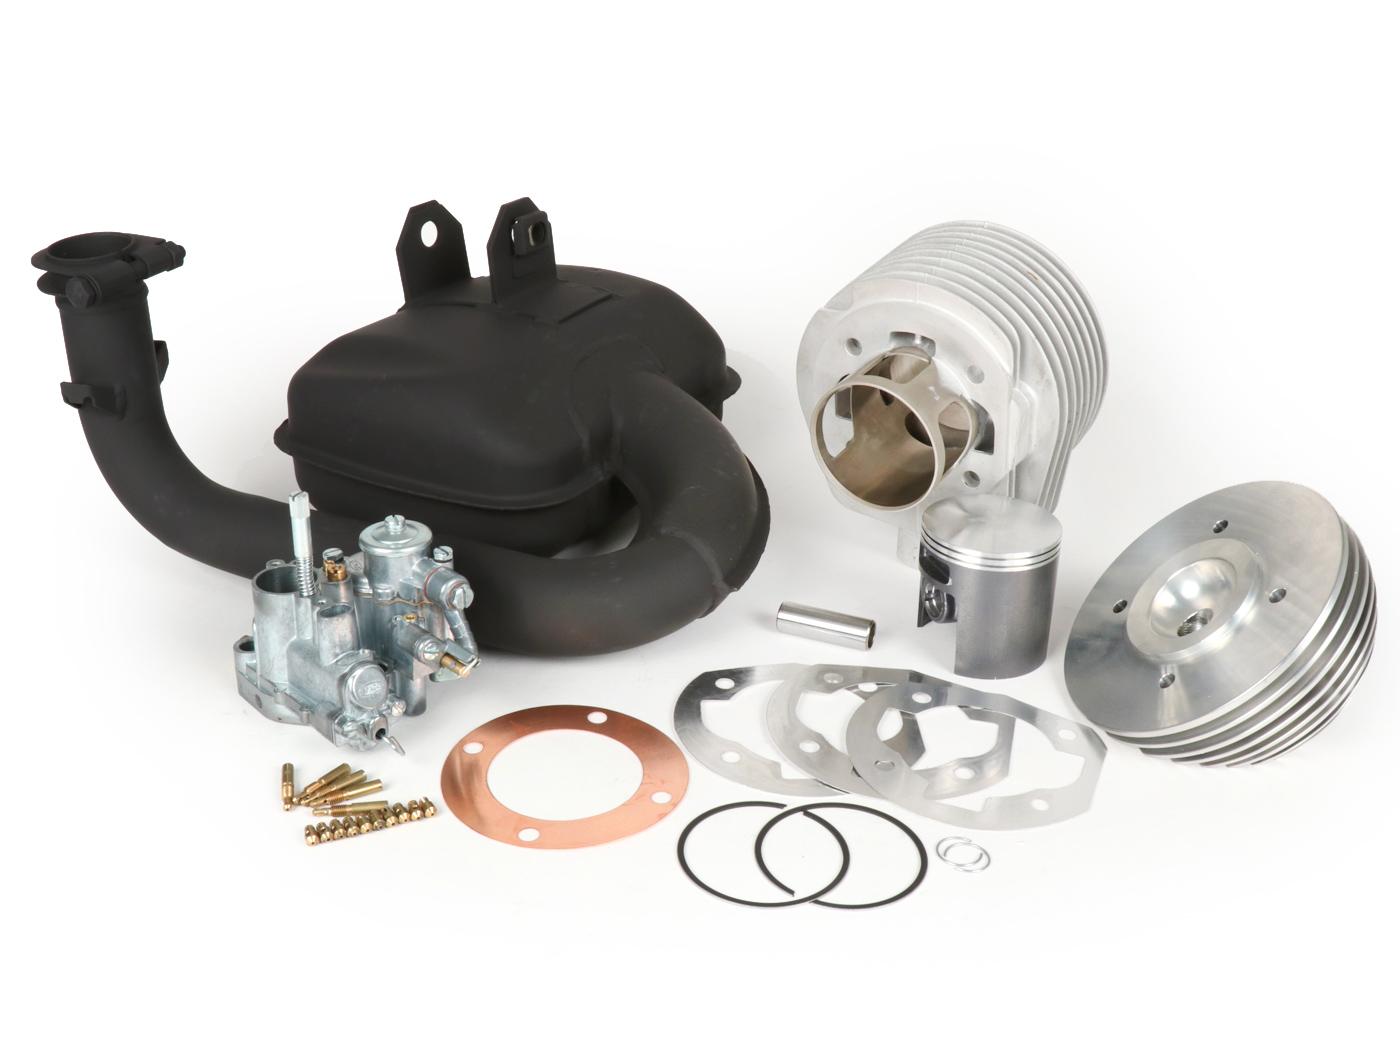 Tuningkit -BGM PRO 177 cc 3 Ports, with autolube- Vespa PX125, PX150,  Cosa125, Cosa150, GTR125, TS125, Sprint Veloce (VLB1T 0150001-) - touring  setup